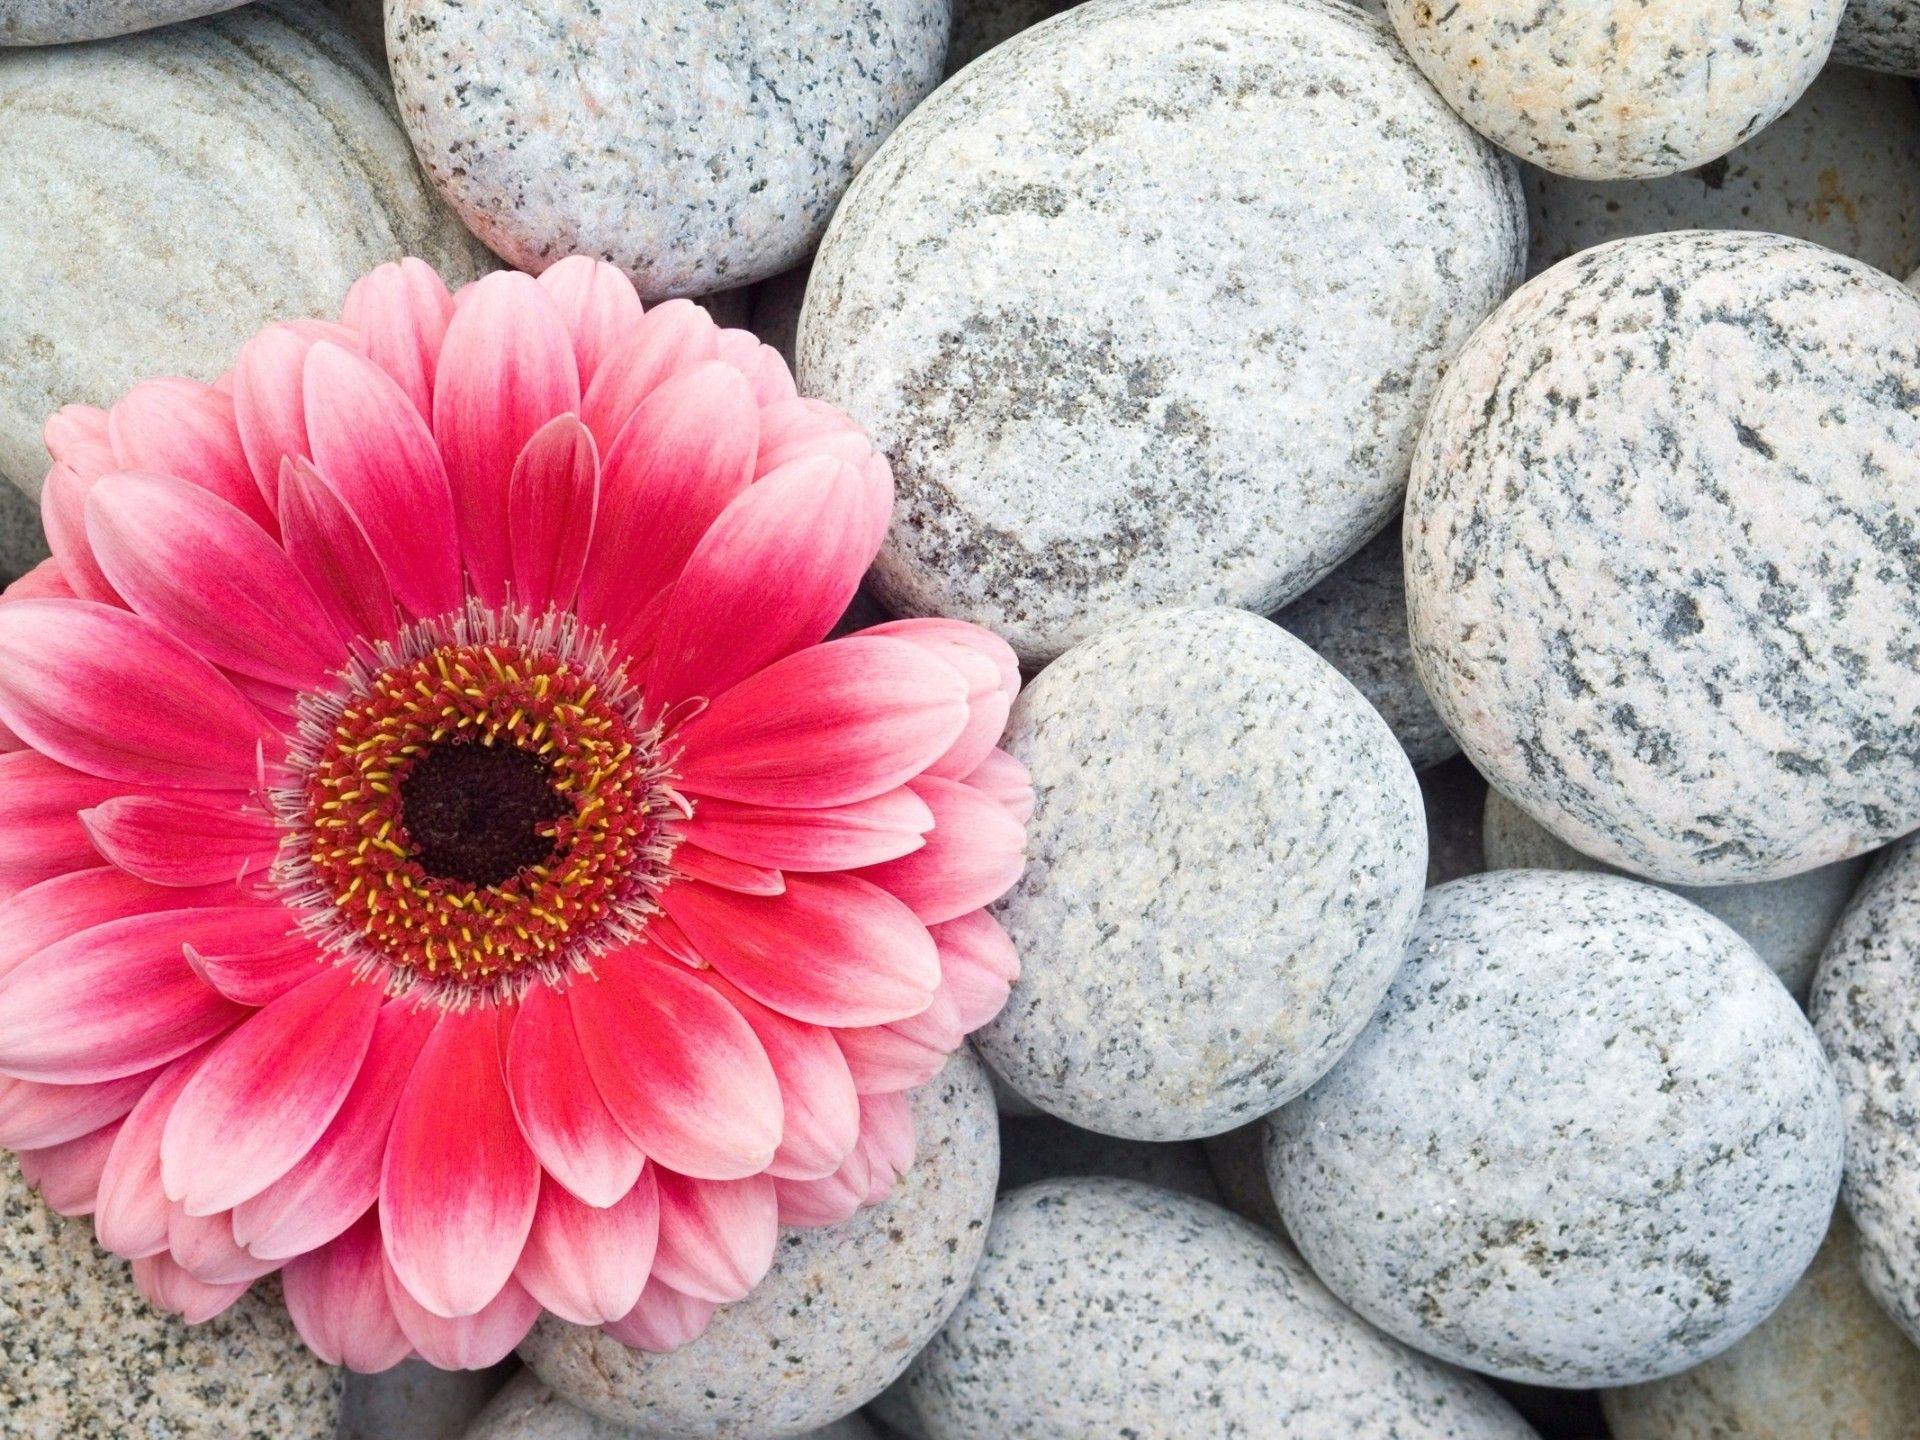 Gerbera Flower Hd Wallpaper 1920x1440 Gerbera Flower Gerbera Pink Gerbera